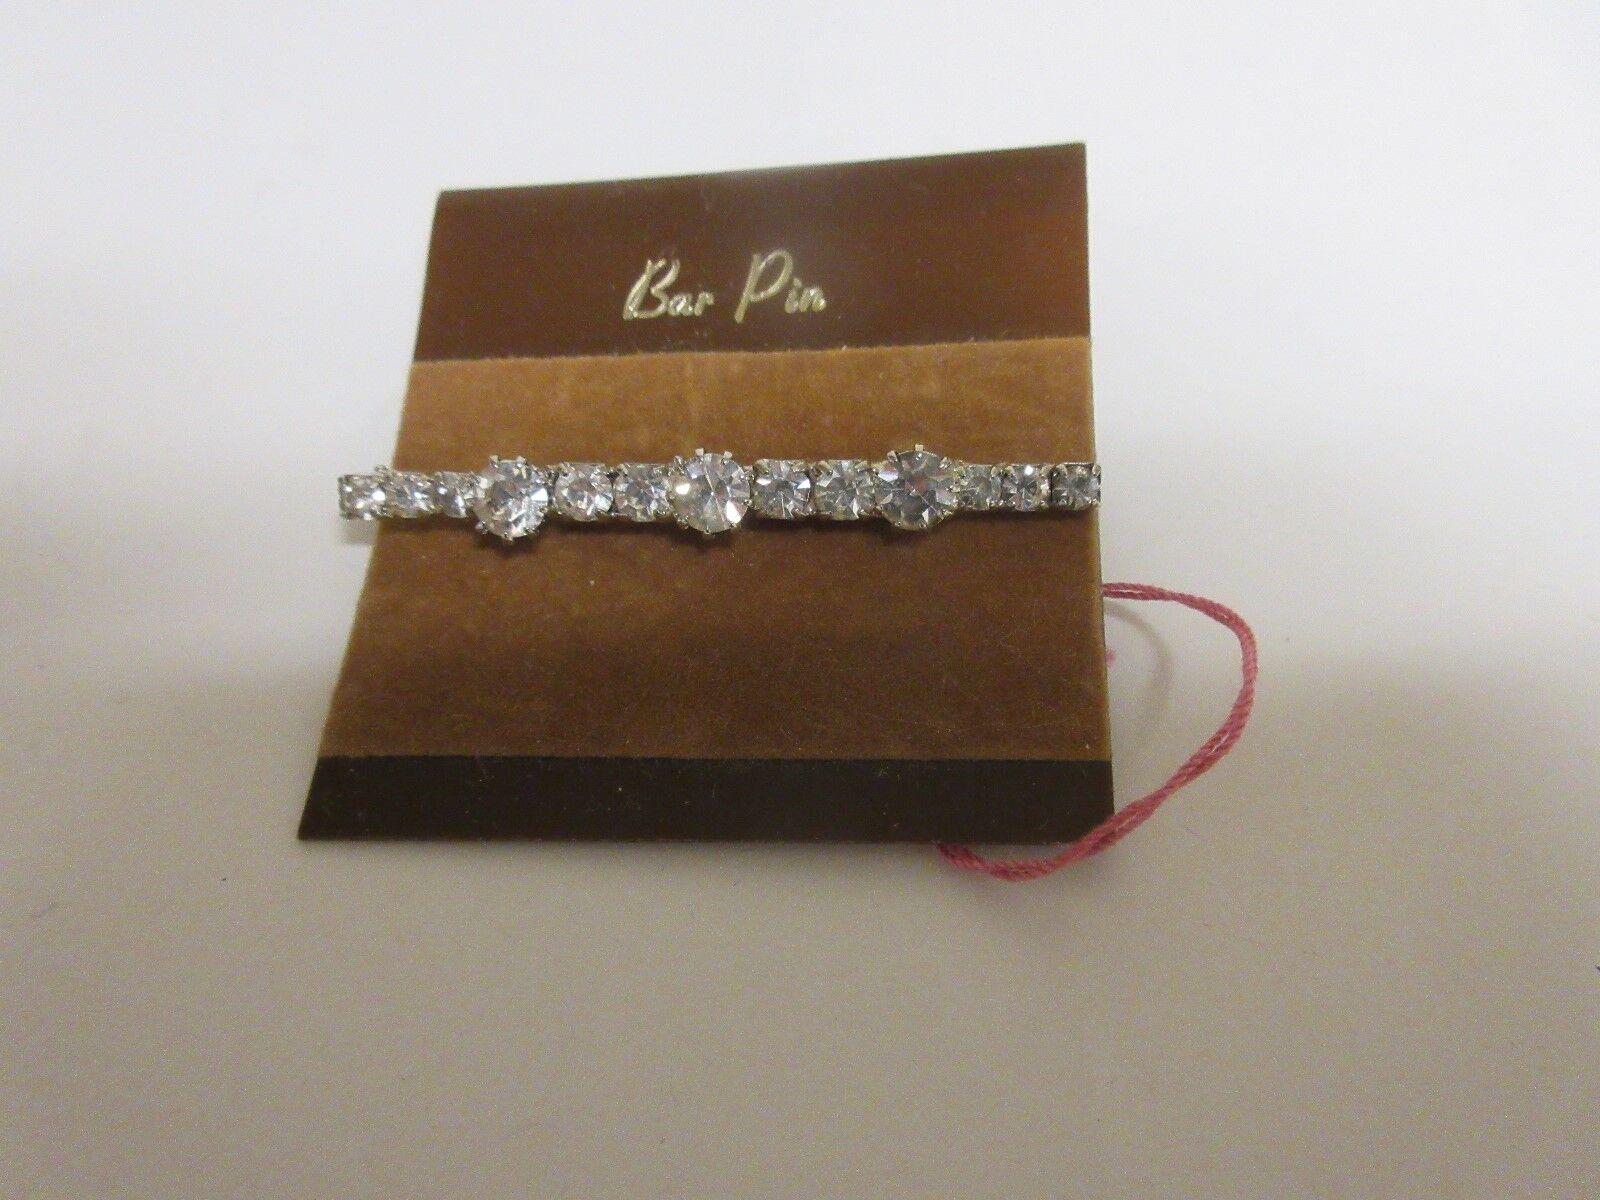 "Costume Jewelry , Bar Pin , 2 1/4"" Long"